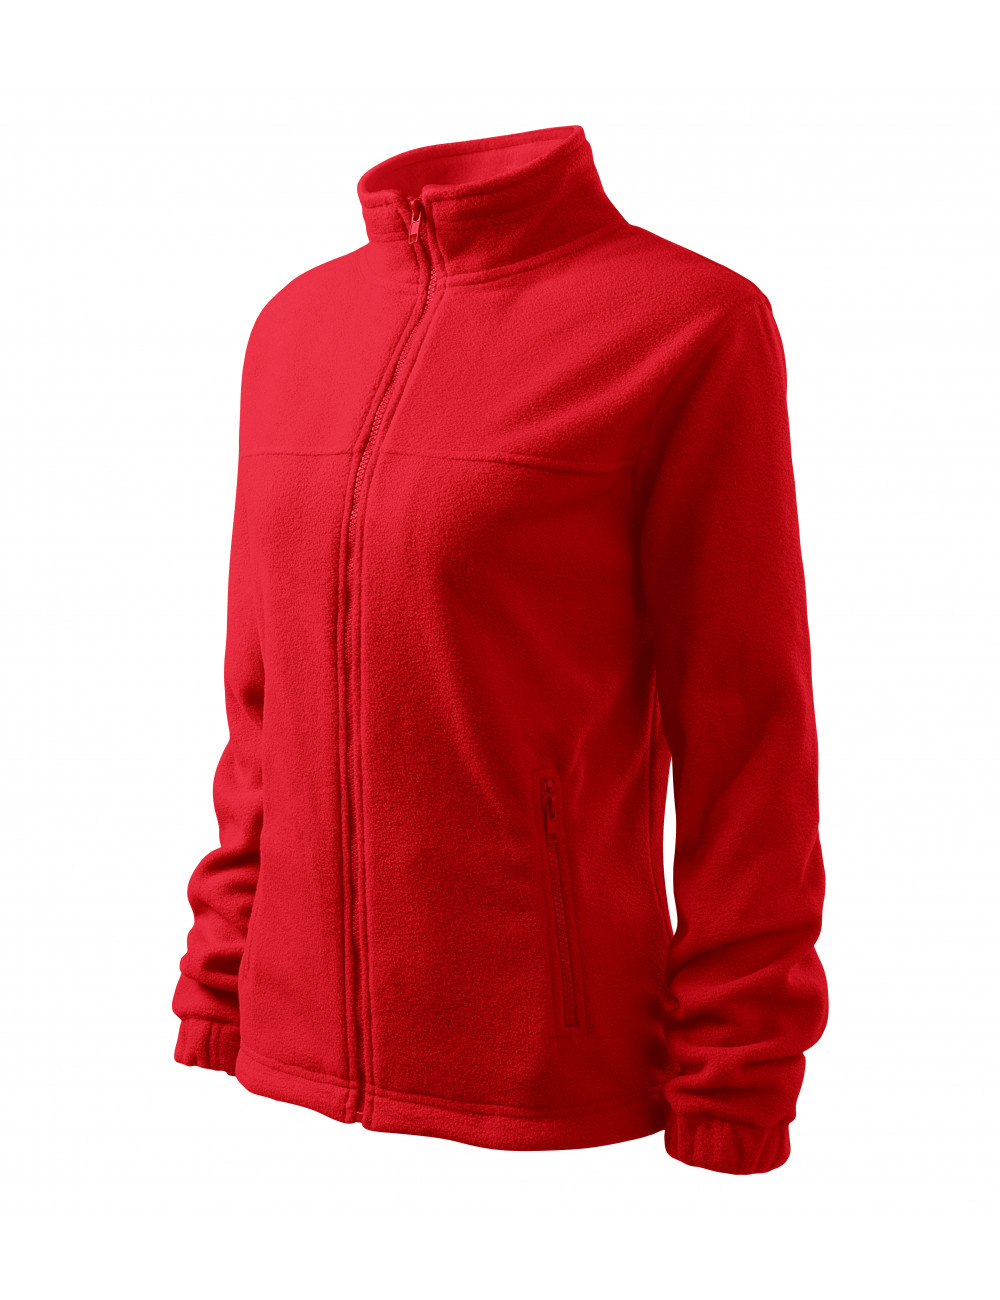 Adler RIMECK Polar damski Jacket 504 czerwony